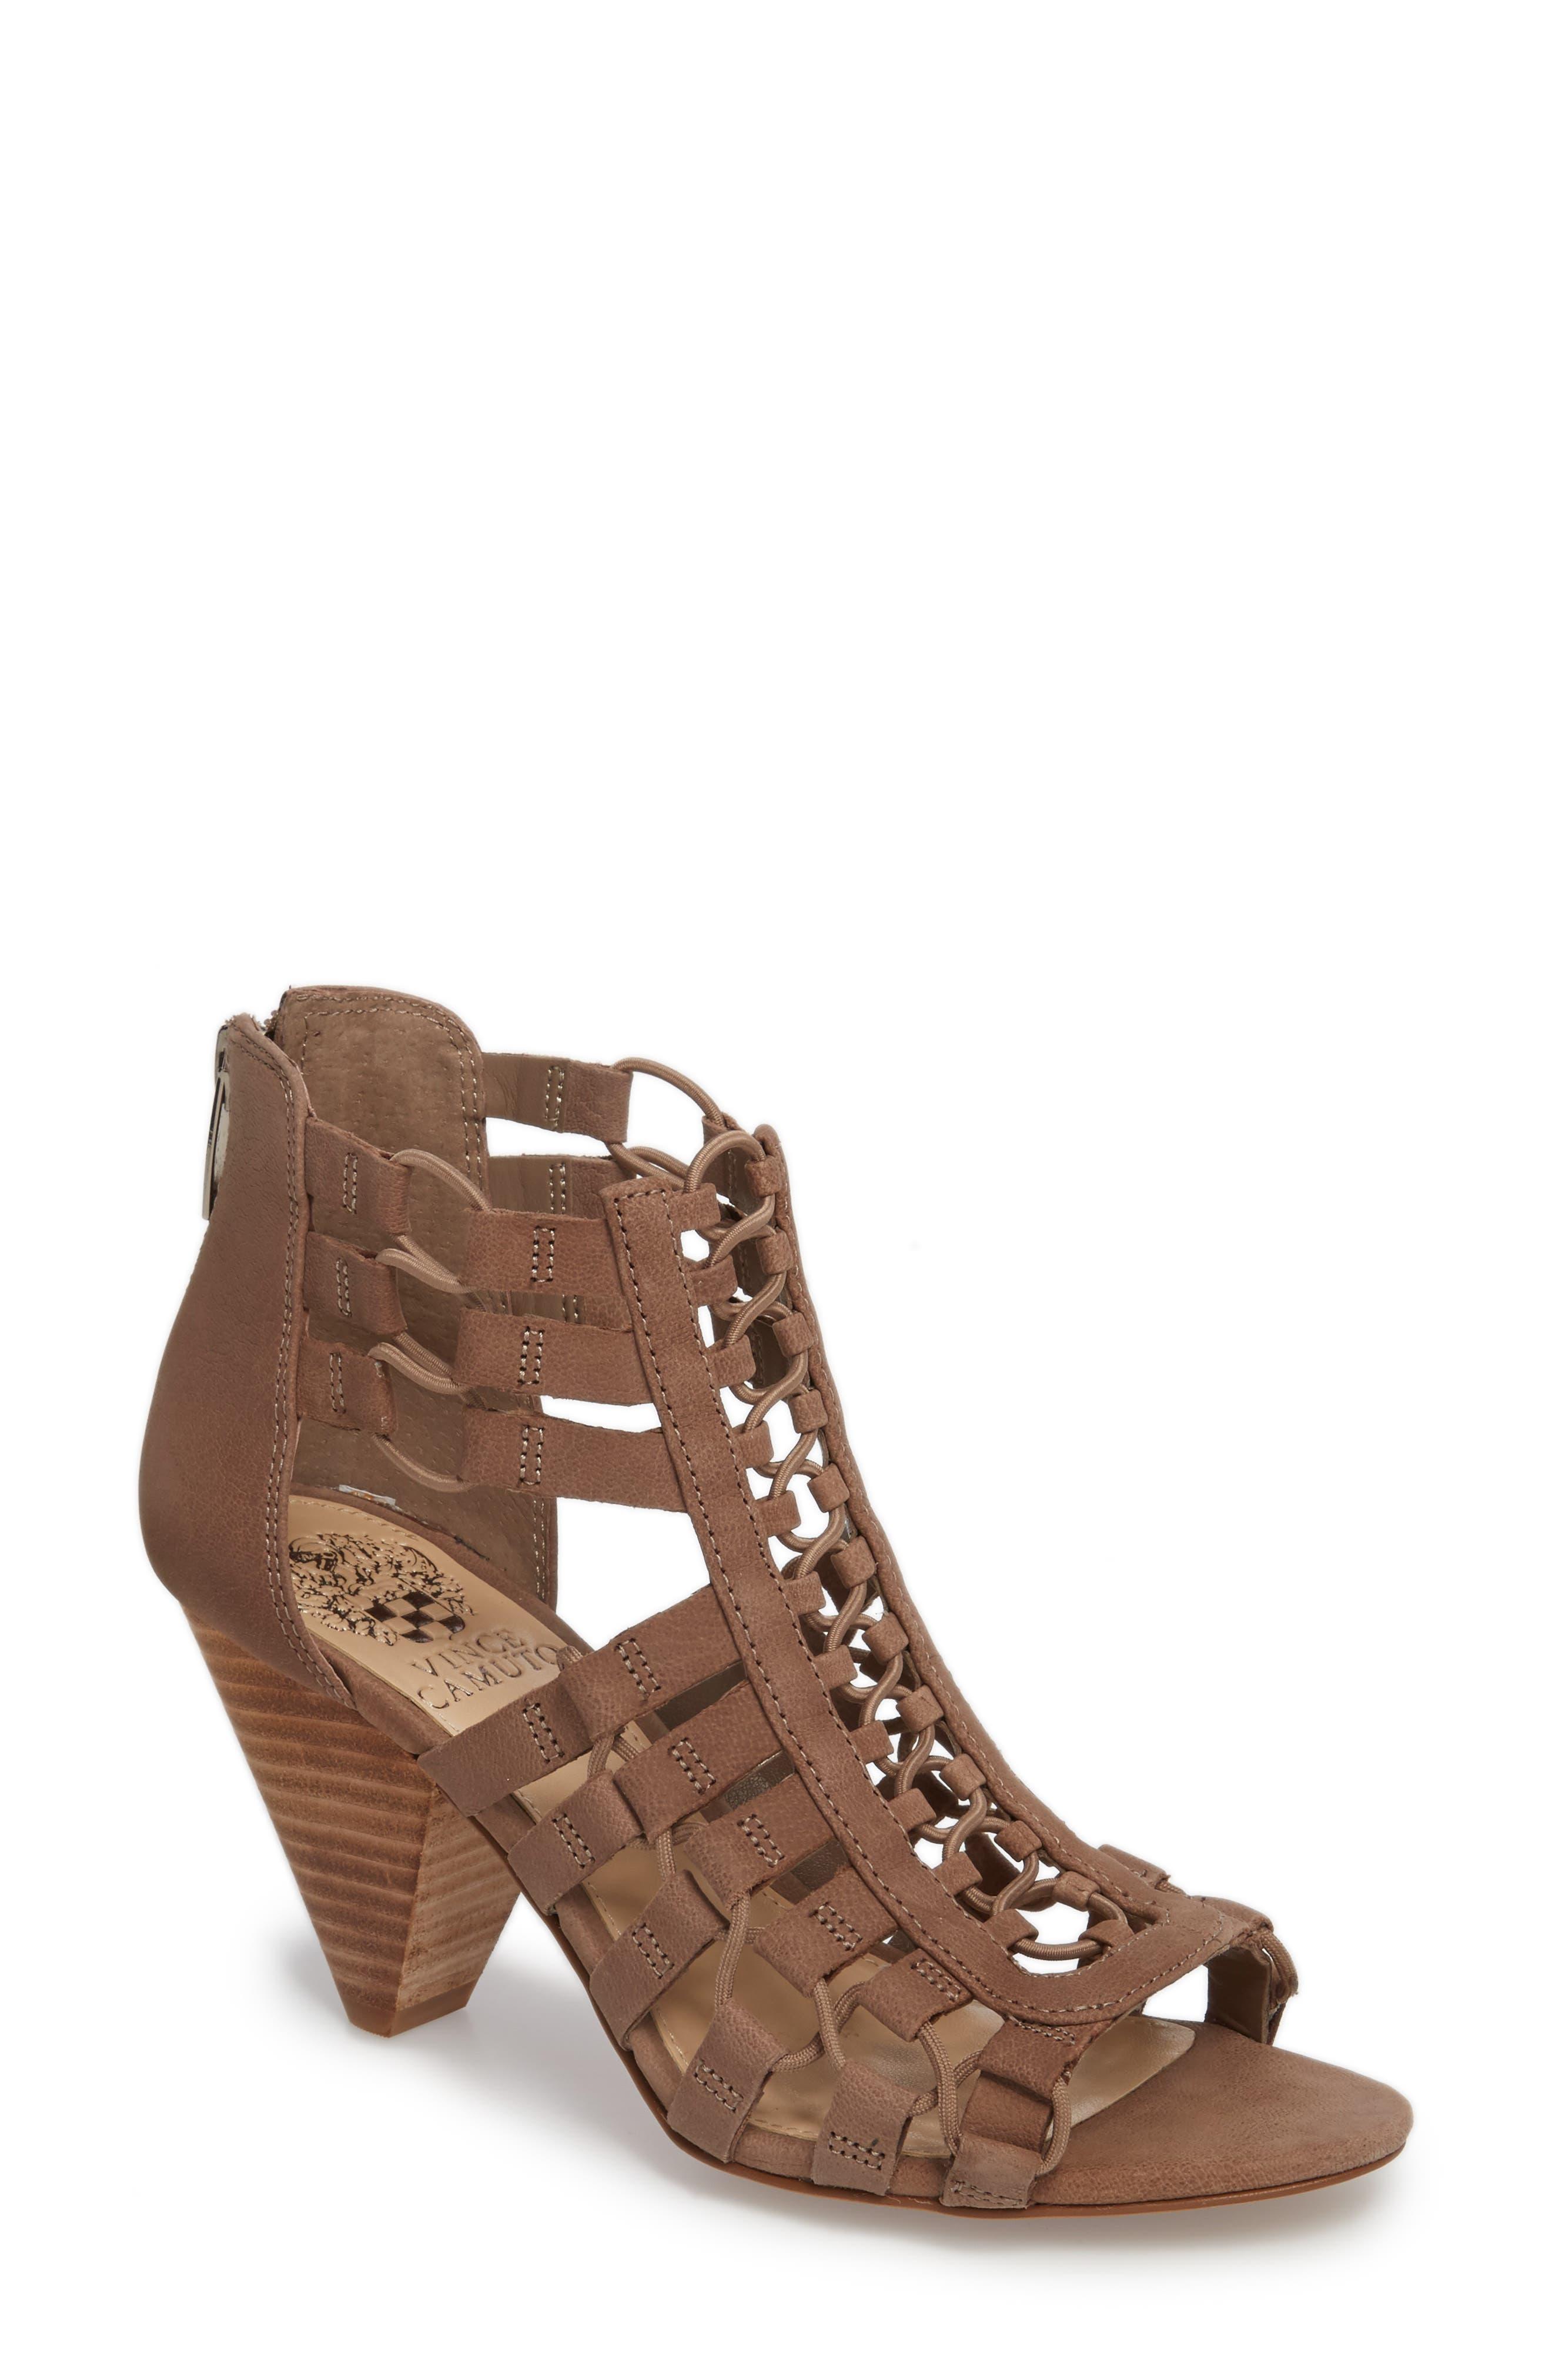 Sandals for Women On Sale, Black, suede, 2017, 3.5 4.5 5.5 7.5 8.5 Jeffrey Campbell